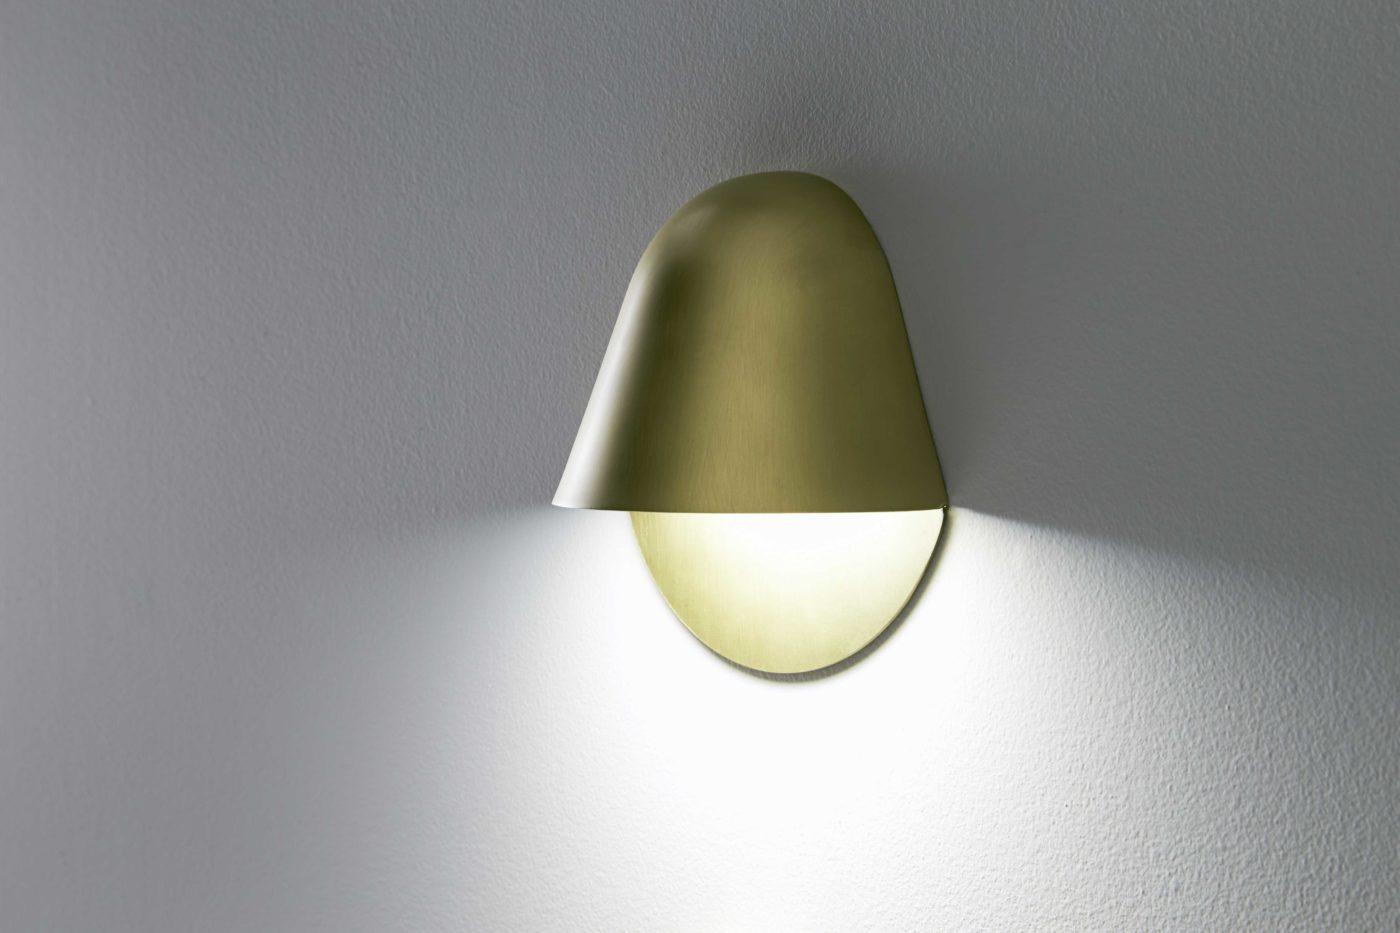 Enoki lamp wall sconce buy Debiasi Sandri for Penta Light